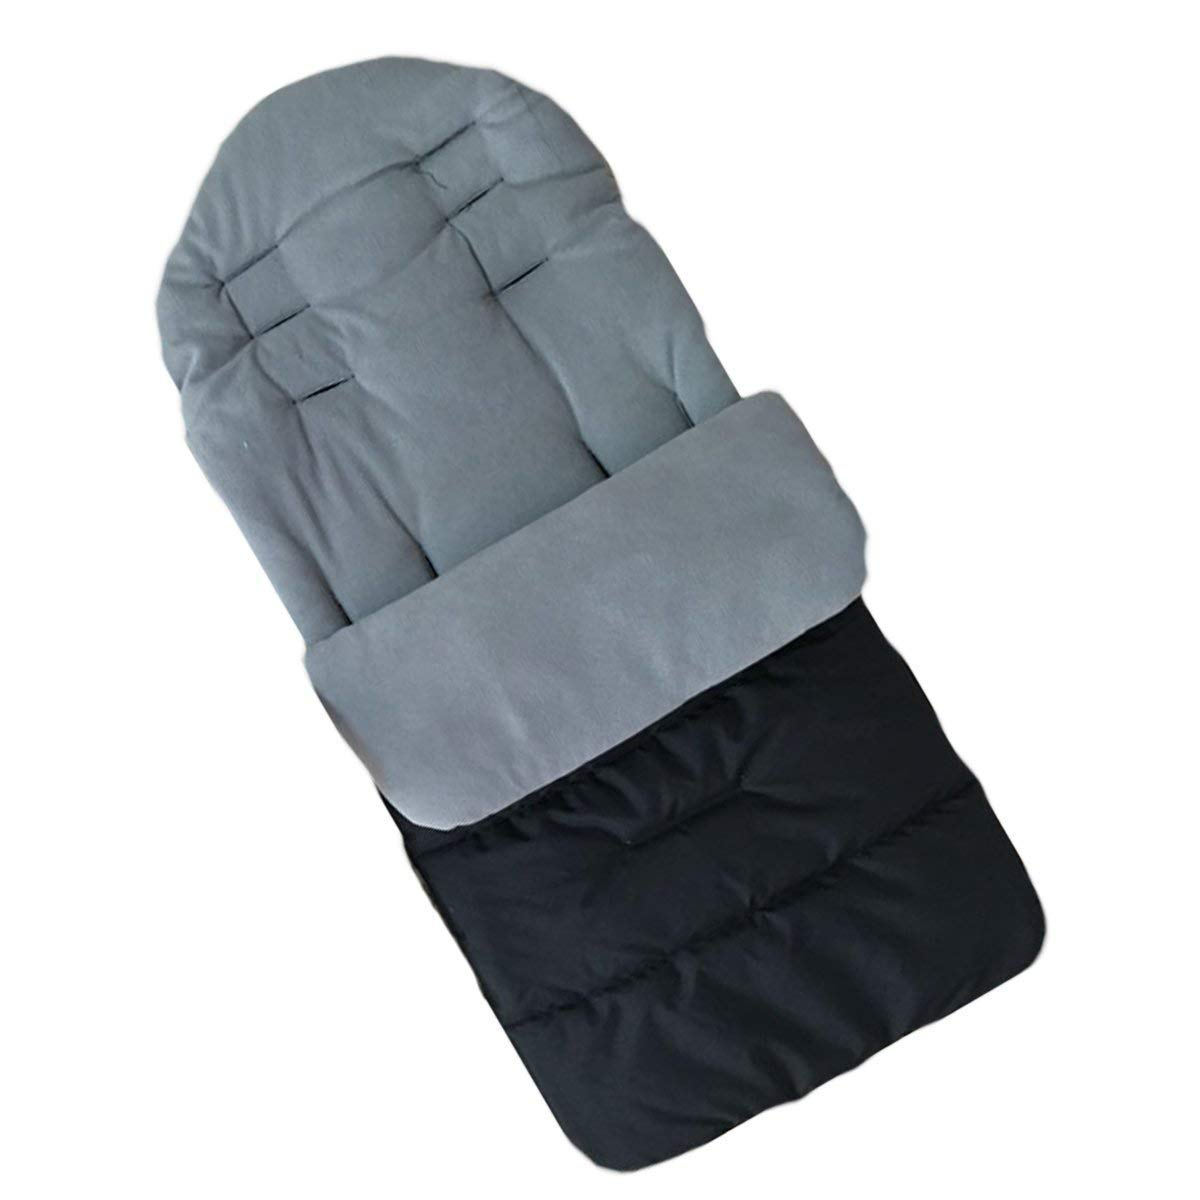 Kinderwagen Universal Fußsack Angenehm Warmes Toe Cover Winter Winddicht Wärme Schlafsack Baby Trolley Baumwolle Kissen Sitzauflage-Grau BALALALA